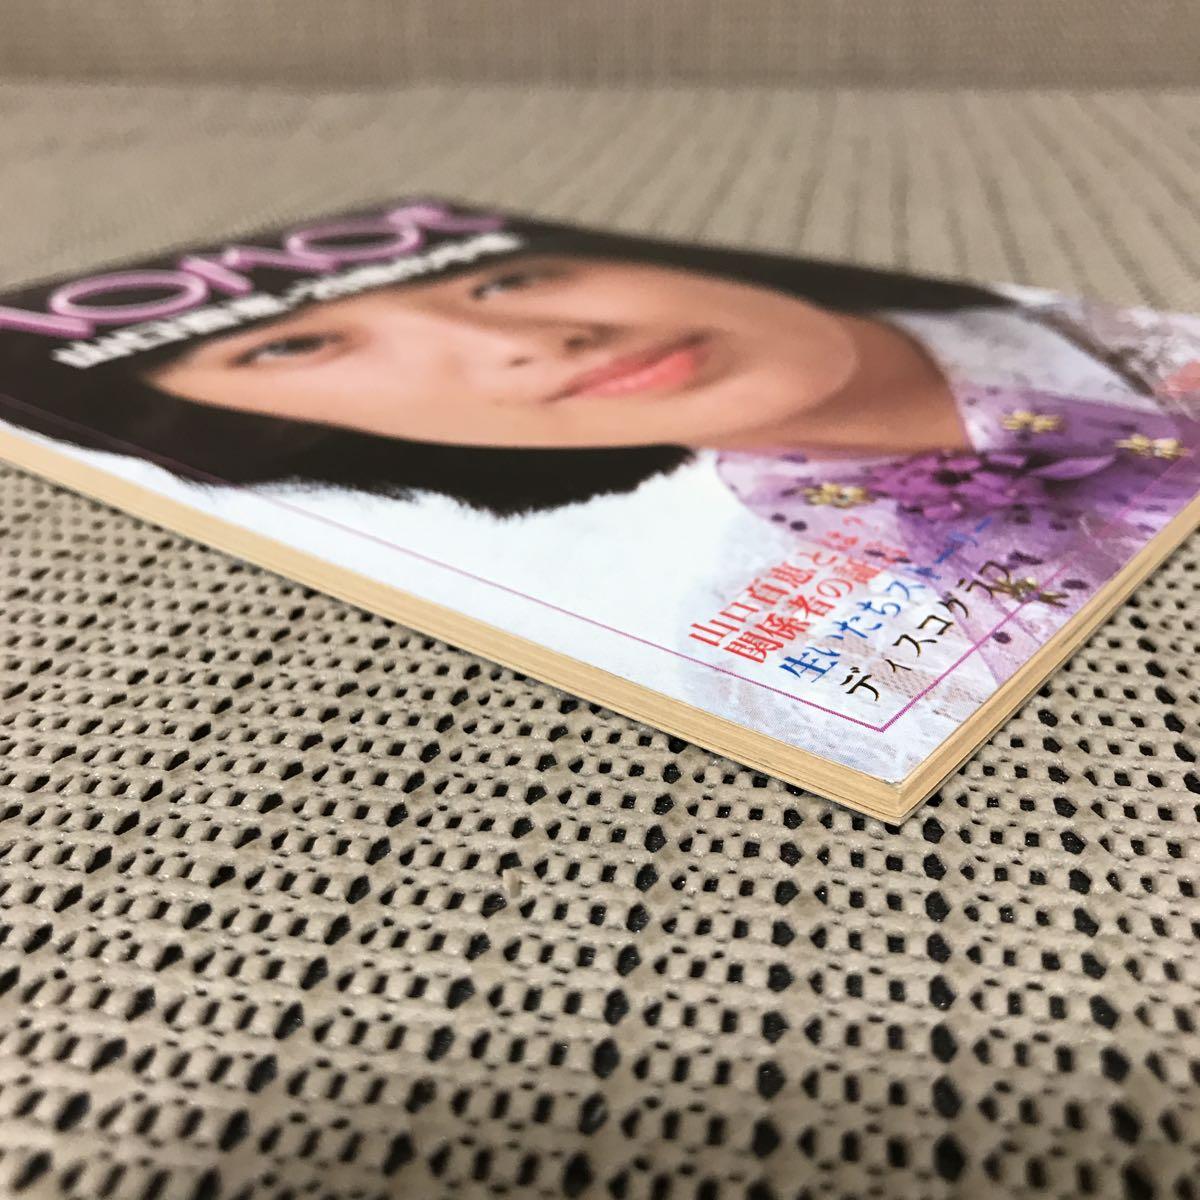 MOMOE 山口百恵・20歳の手帳 近代映画附録/昭和54年5月号 状態良好です_画像5